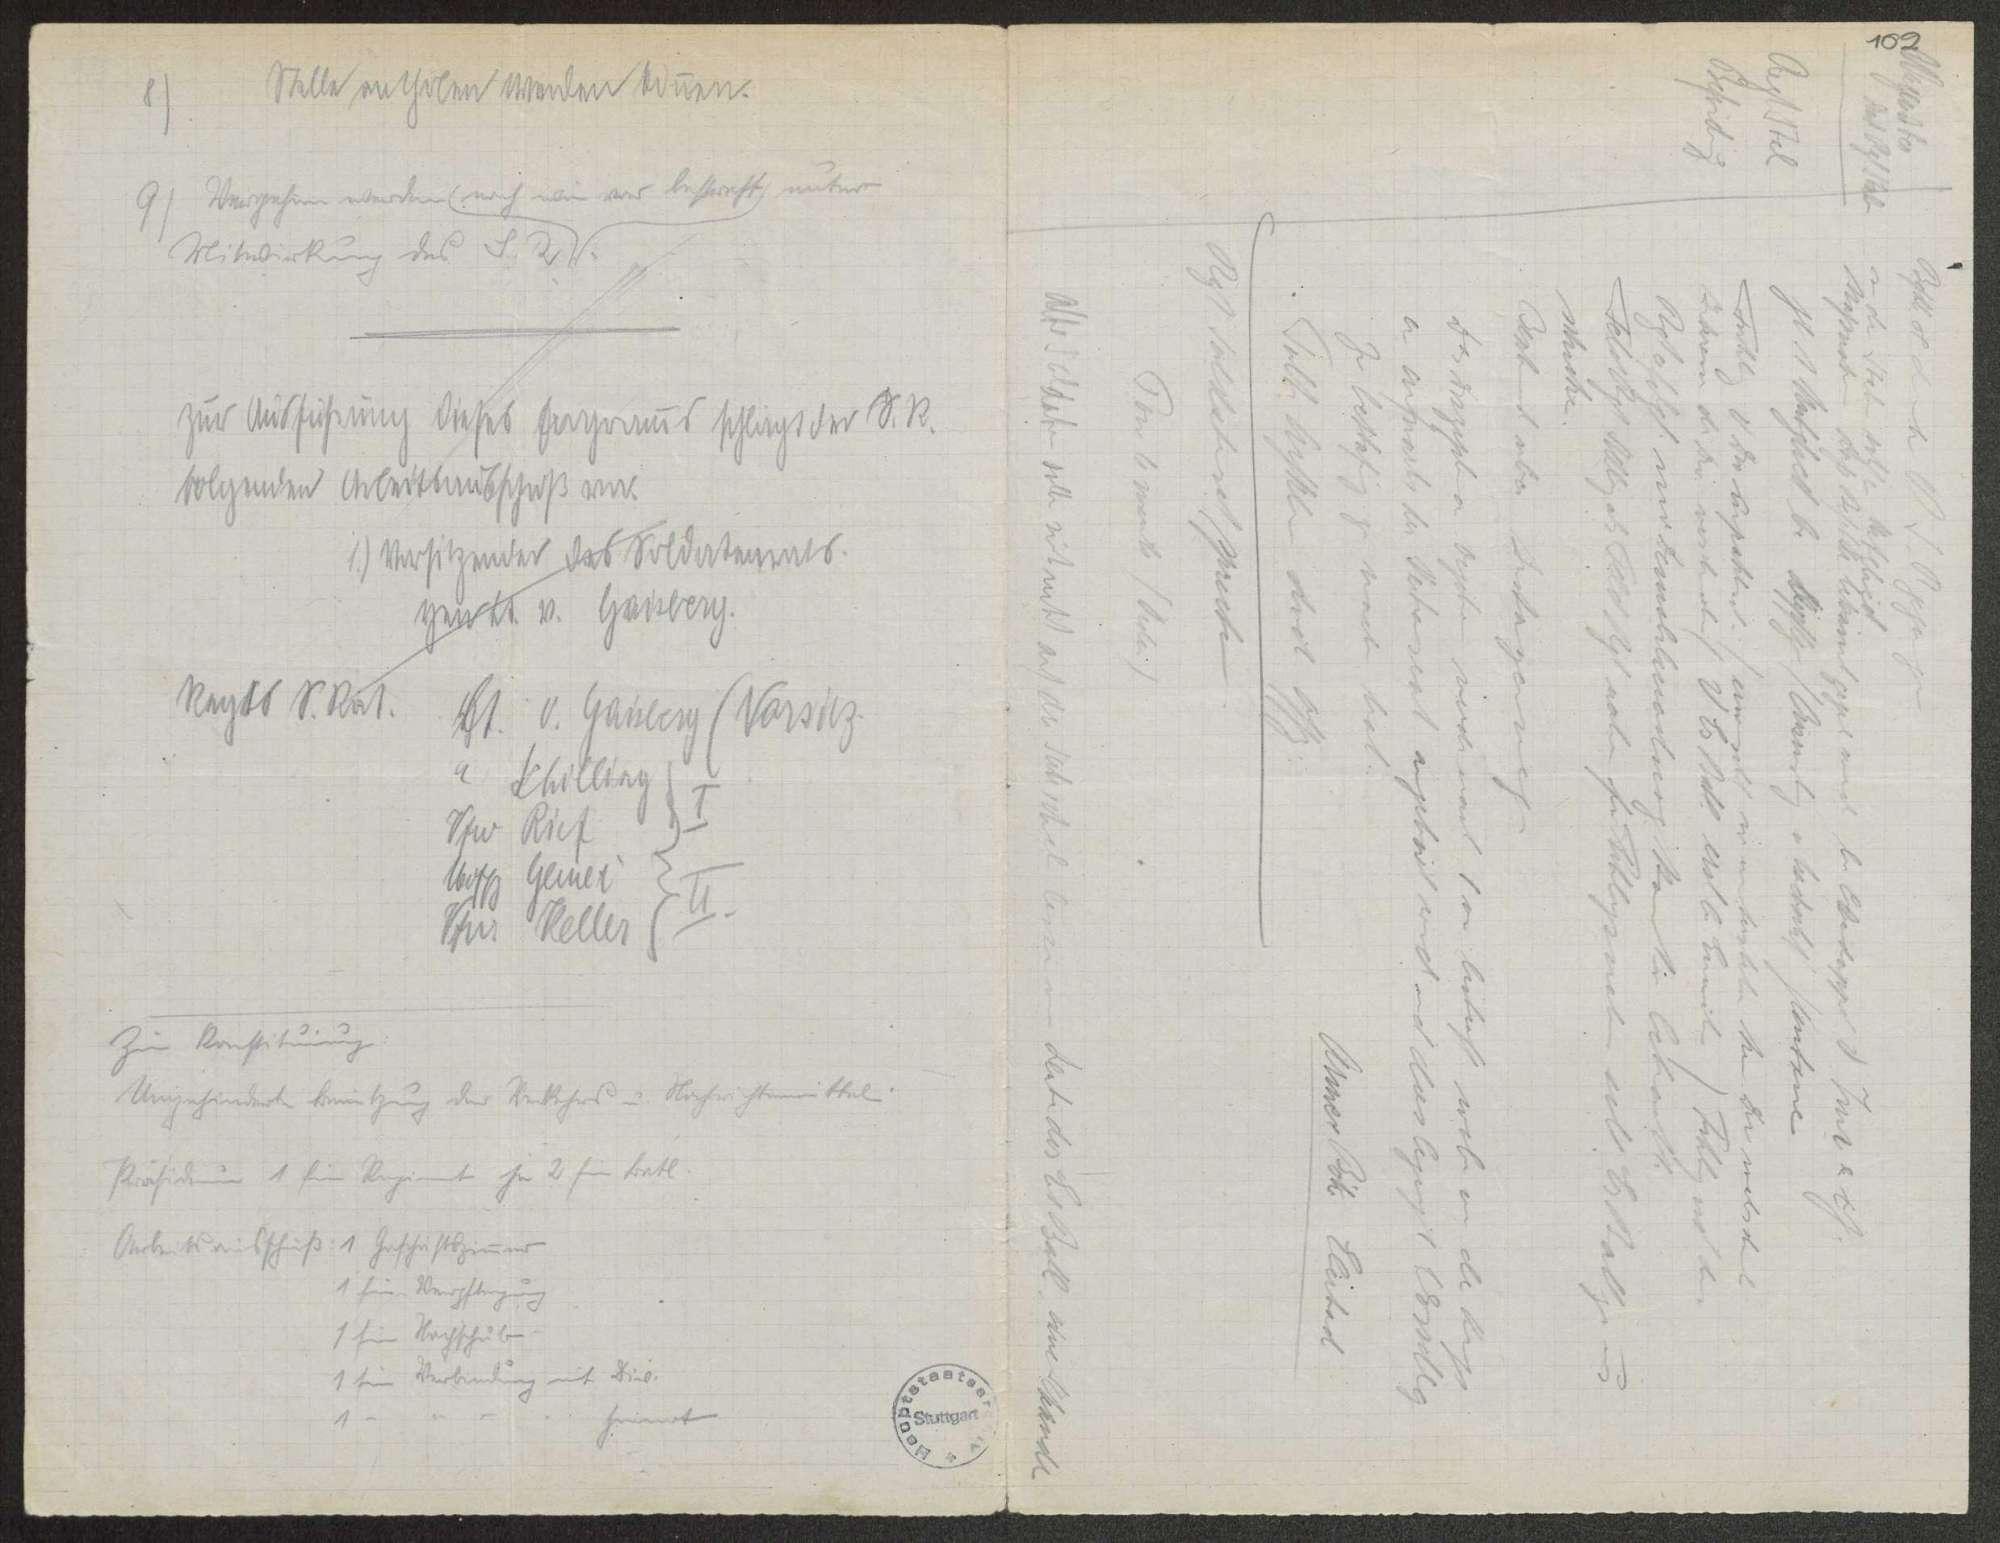 Sitzungsprotokolle des Soldatenrats des (Feld-)Gebirgsregiments, Bild 2